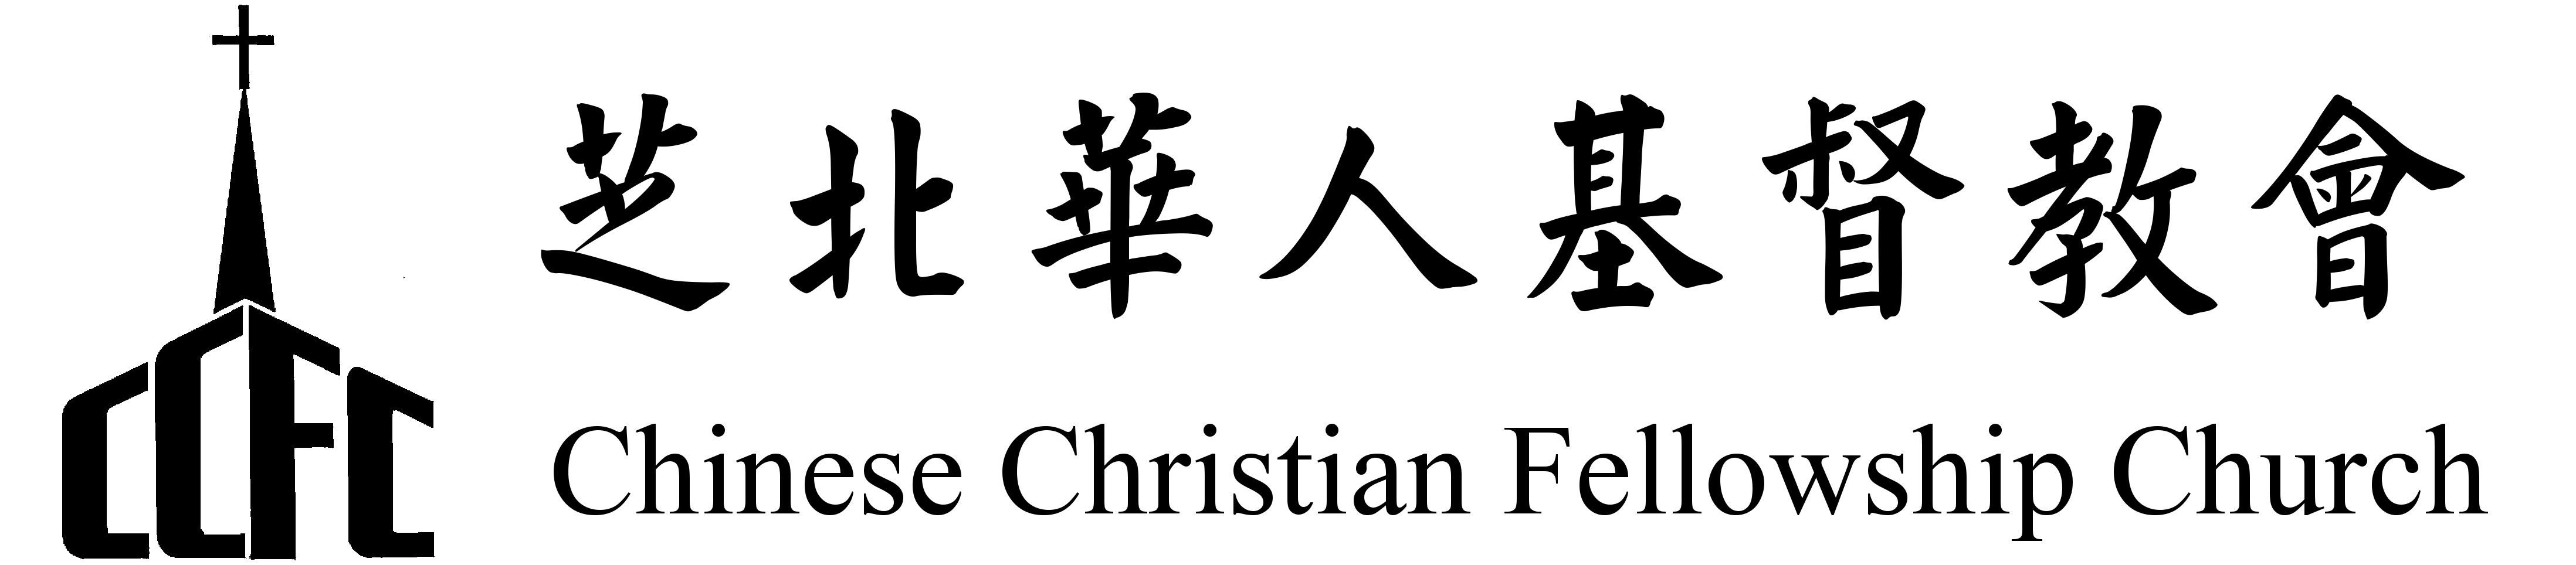 ccfc-banner-nobg-000000